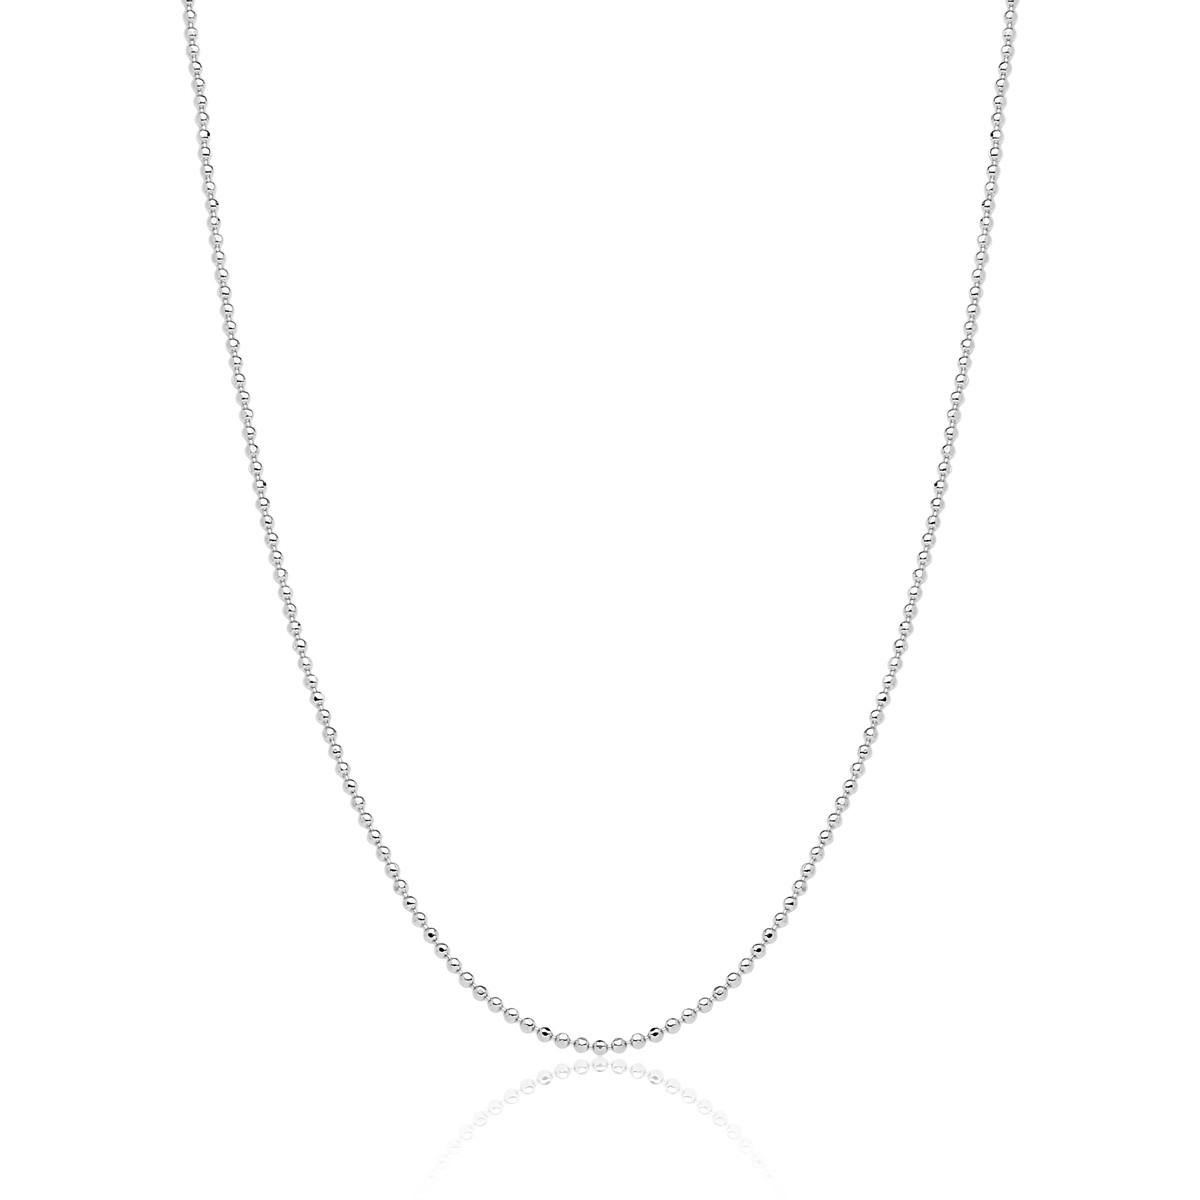 Corrente  Boule D'argent de Diamant Revestida em Prata